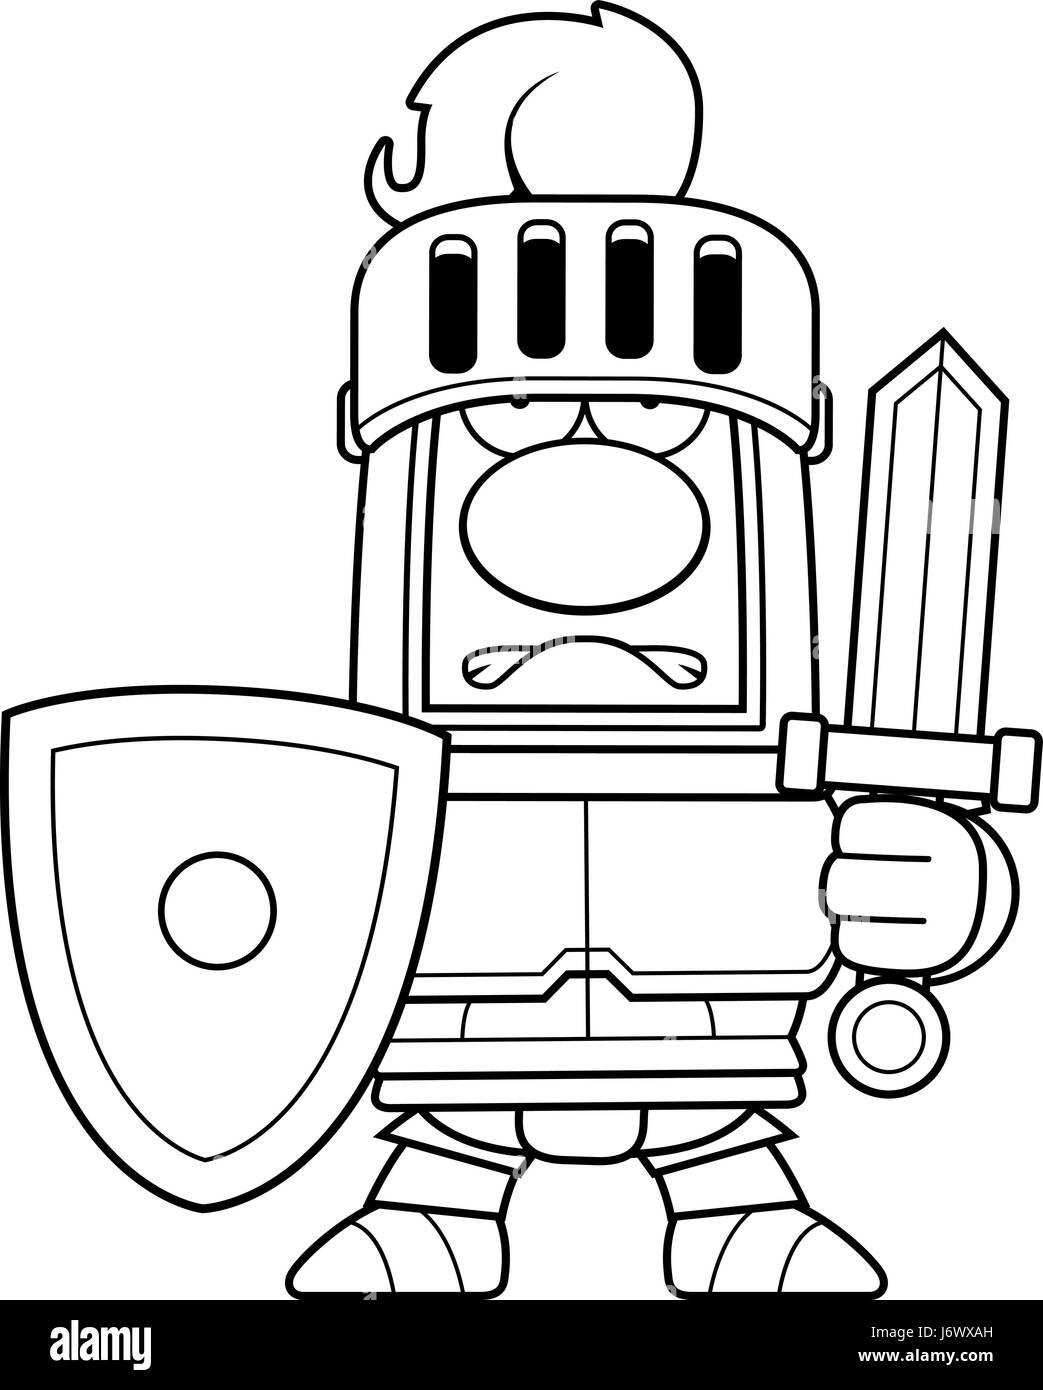 knight in armor cartoon illustration stock photos u0026 knight in